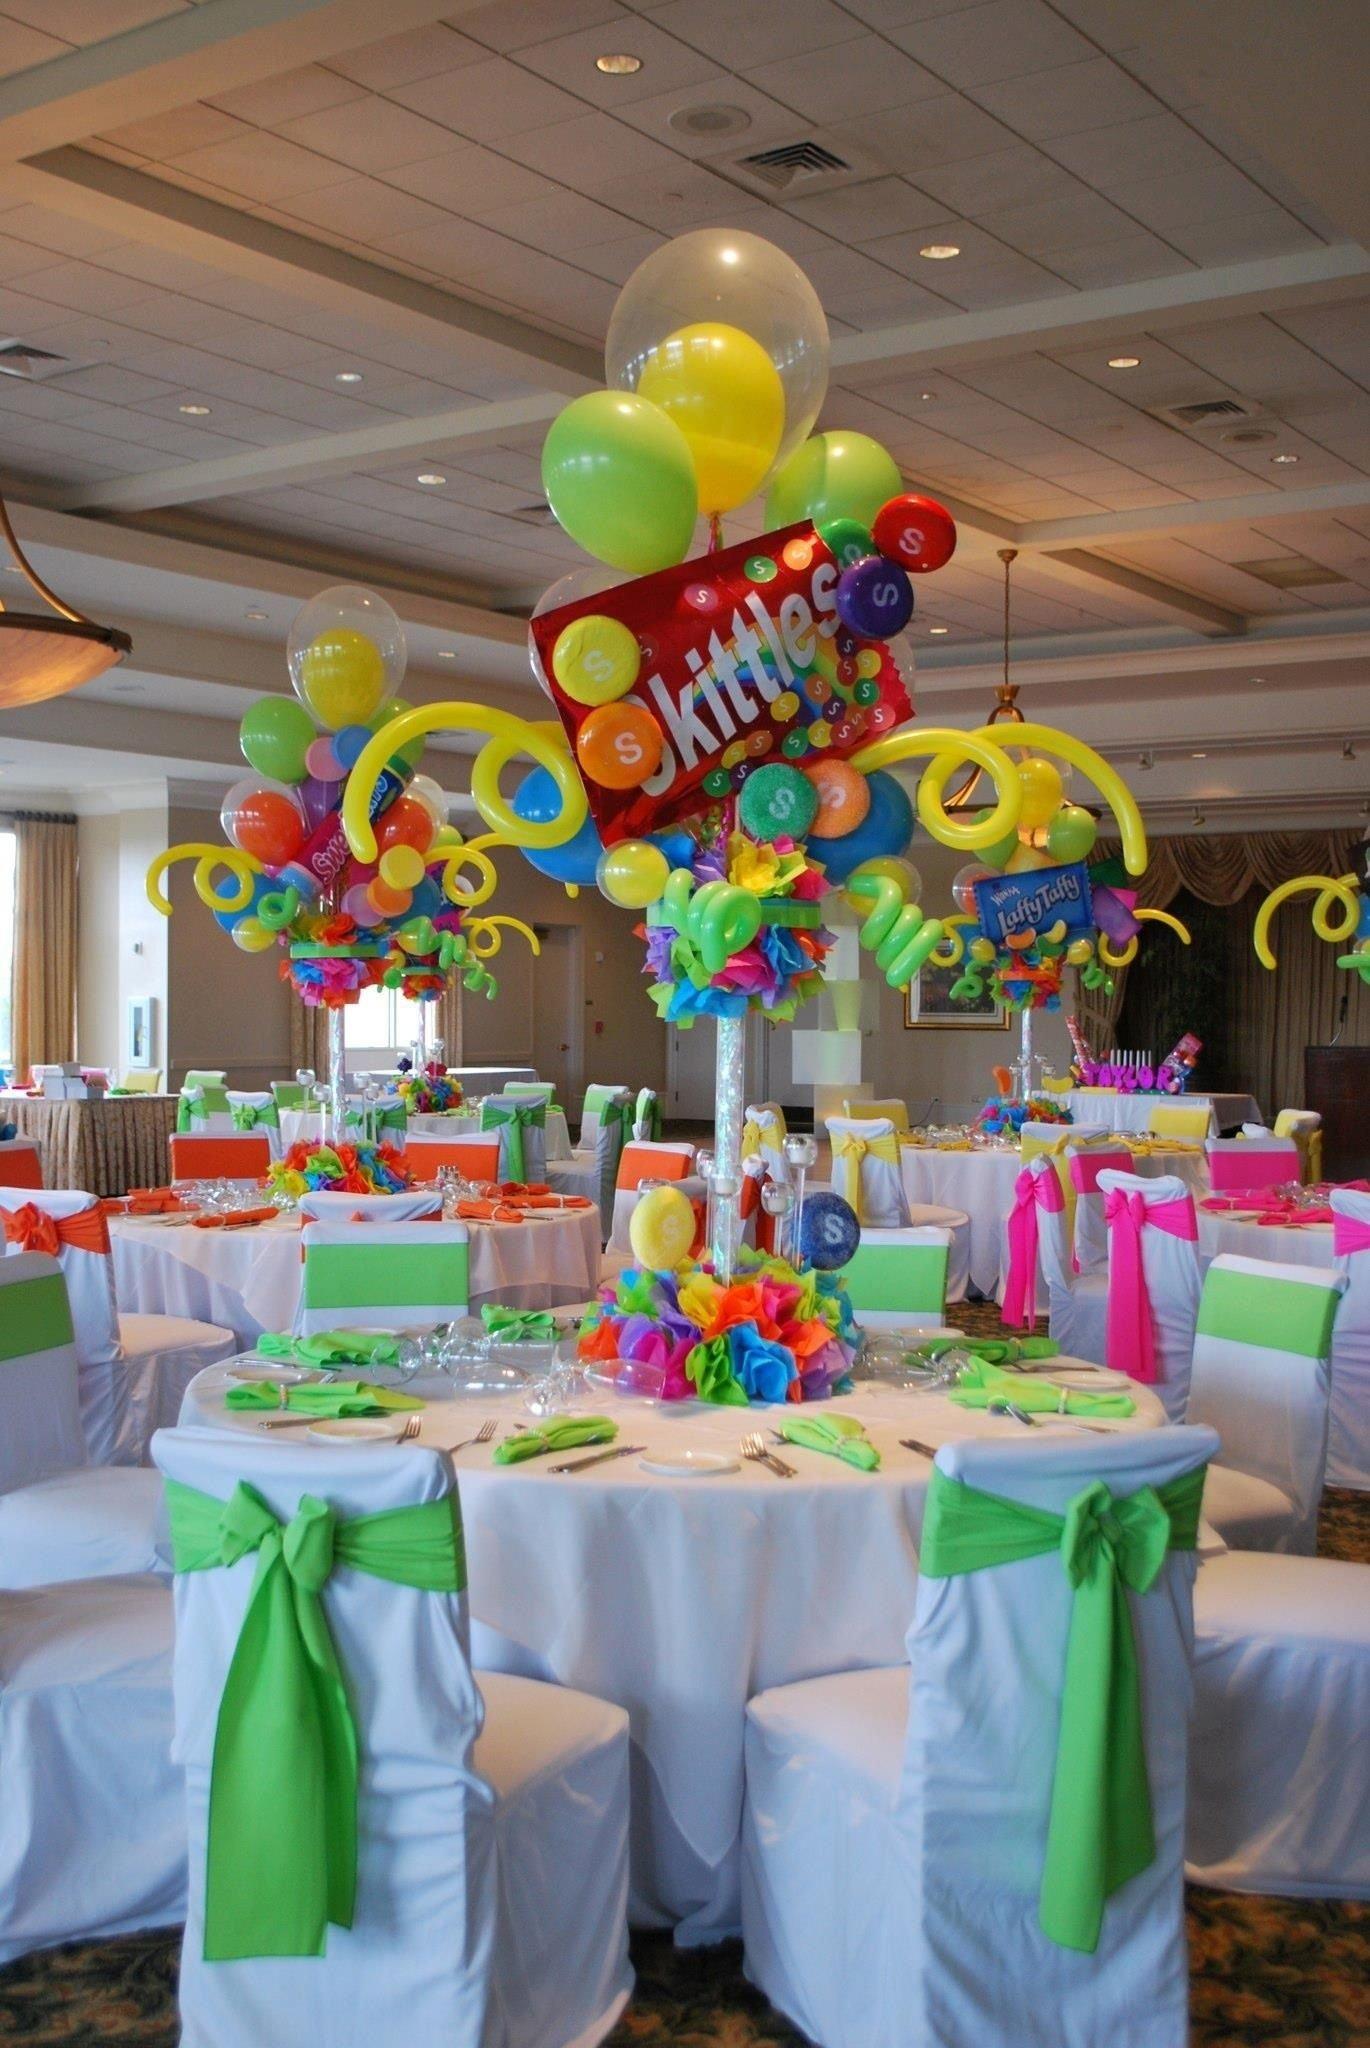 10 Unique Theme Party Ideas For Adults candy themed bat mitzvah event decor adult centerpieces party 5 2021